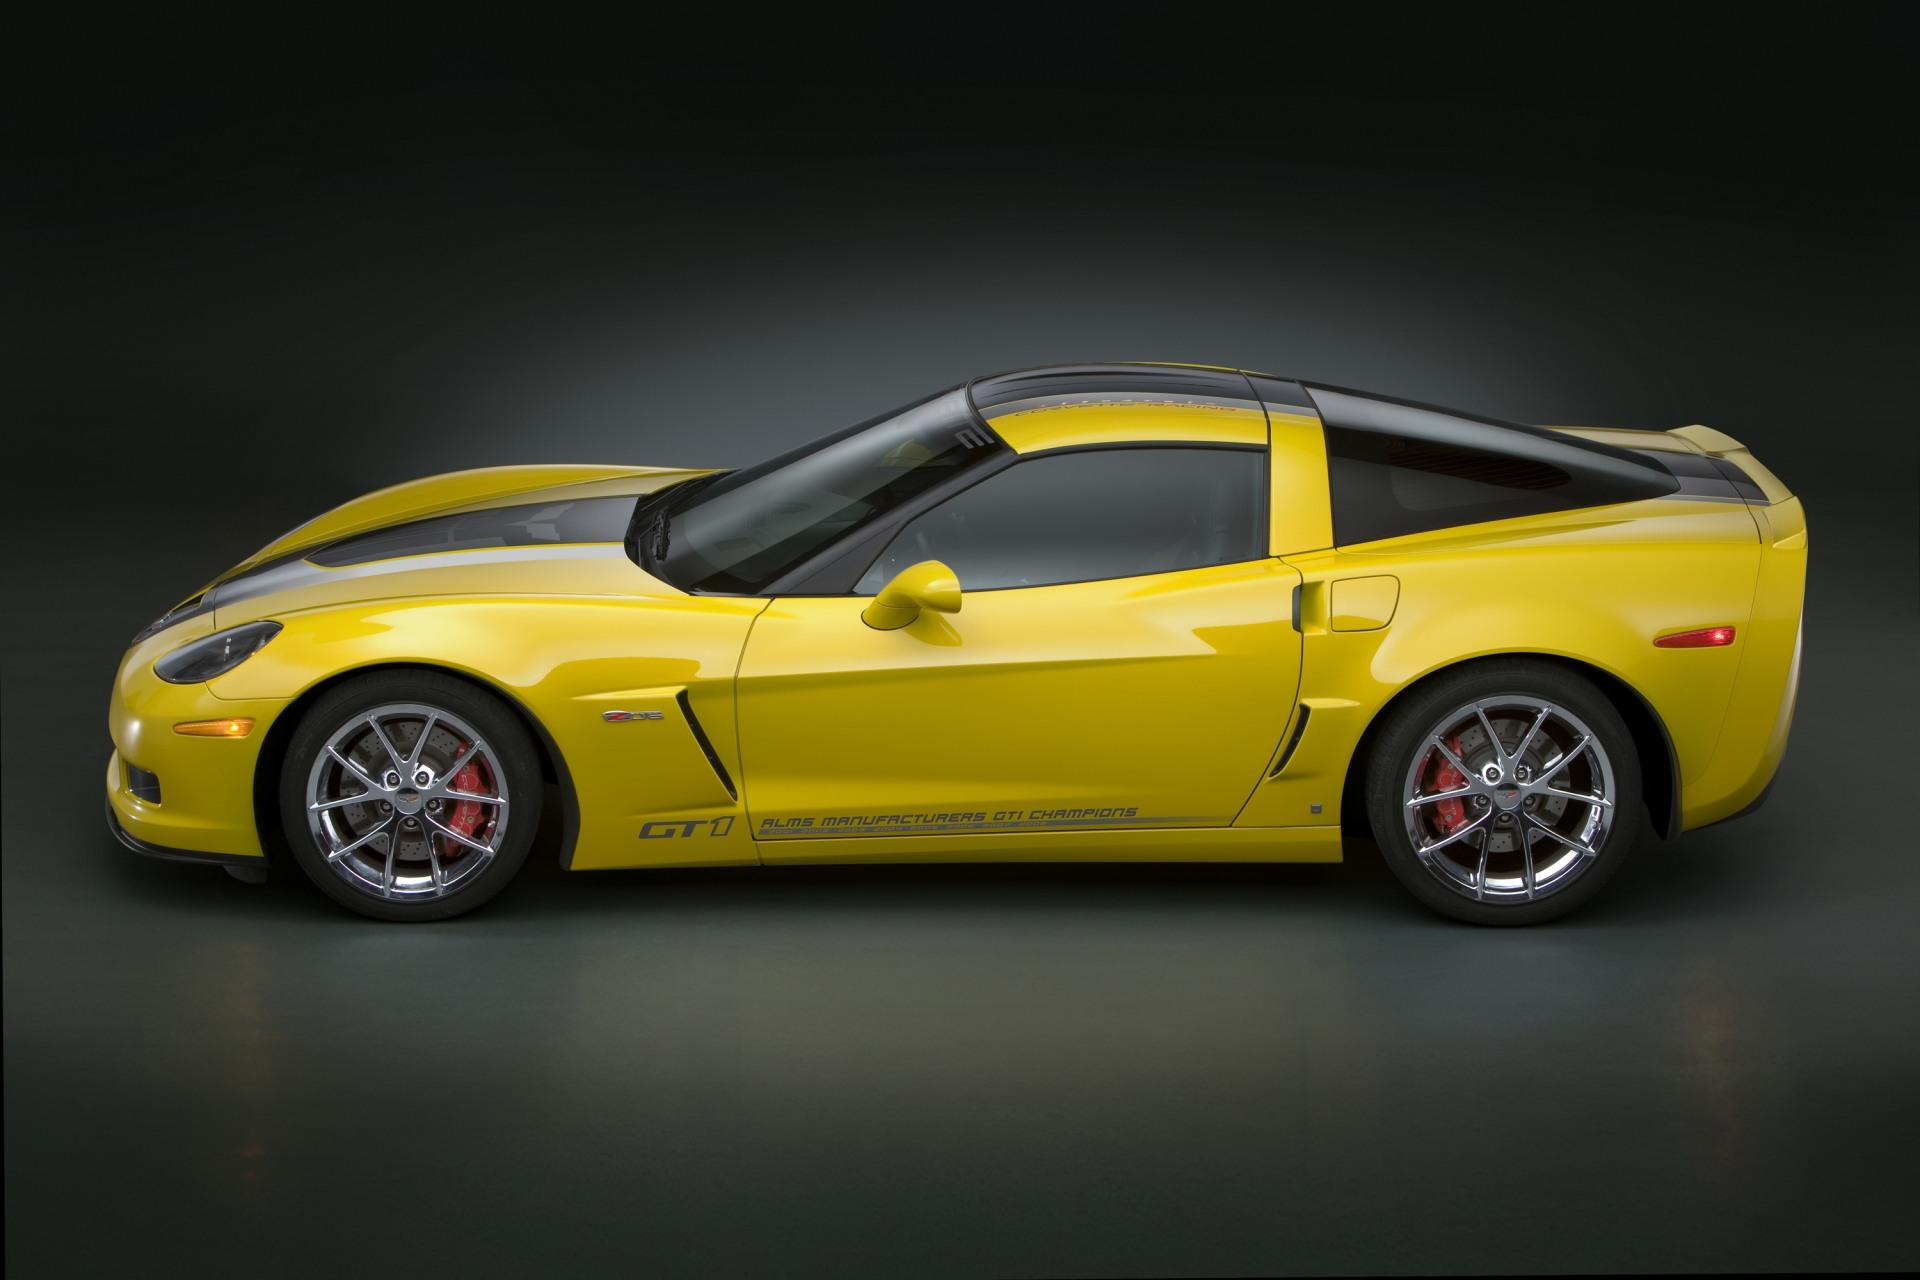 2009 chevrolet corvette gt1 championship edition. Black Bedroom Furniture Sets. Home Design Ideas